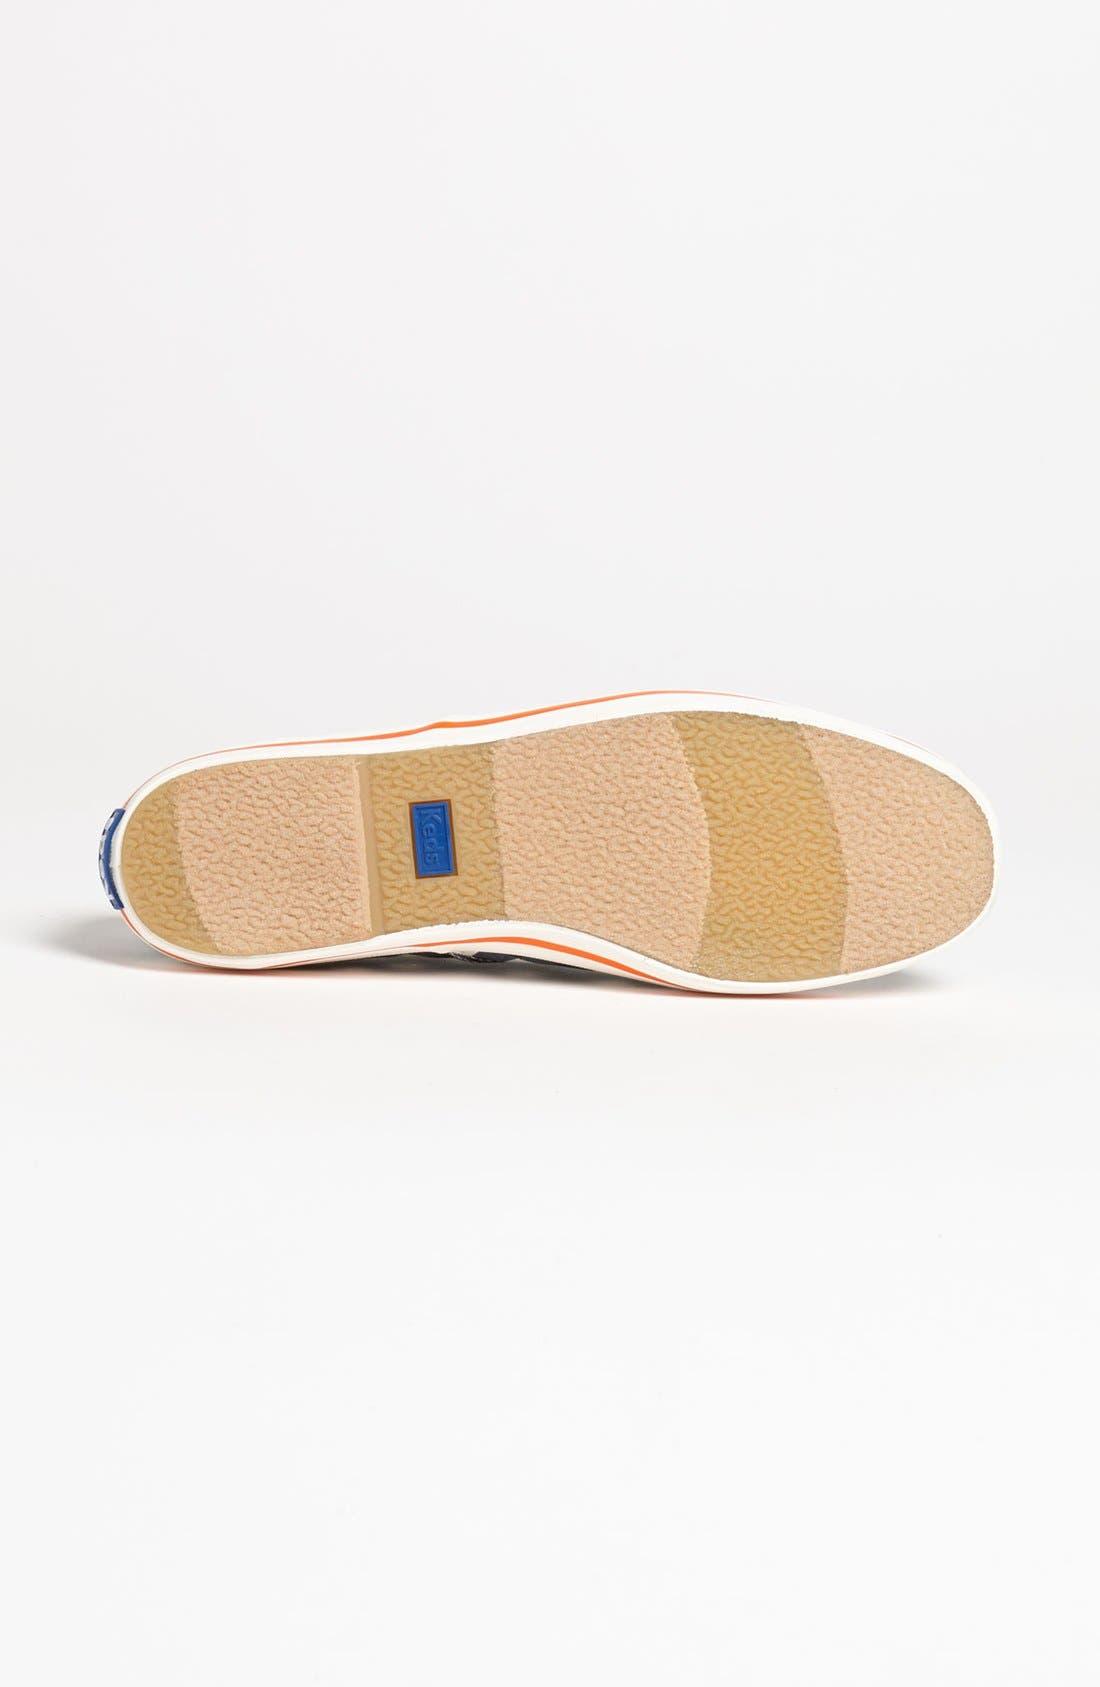 Keds<sup>®</sup> for kate spade new york 'kick' sneaker,                             Alternate thumbnail 10, color,